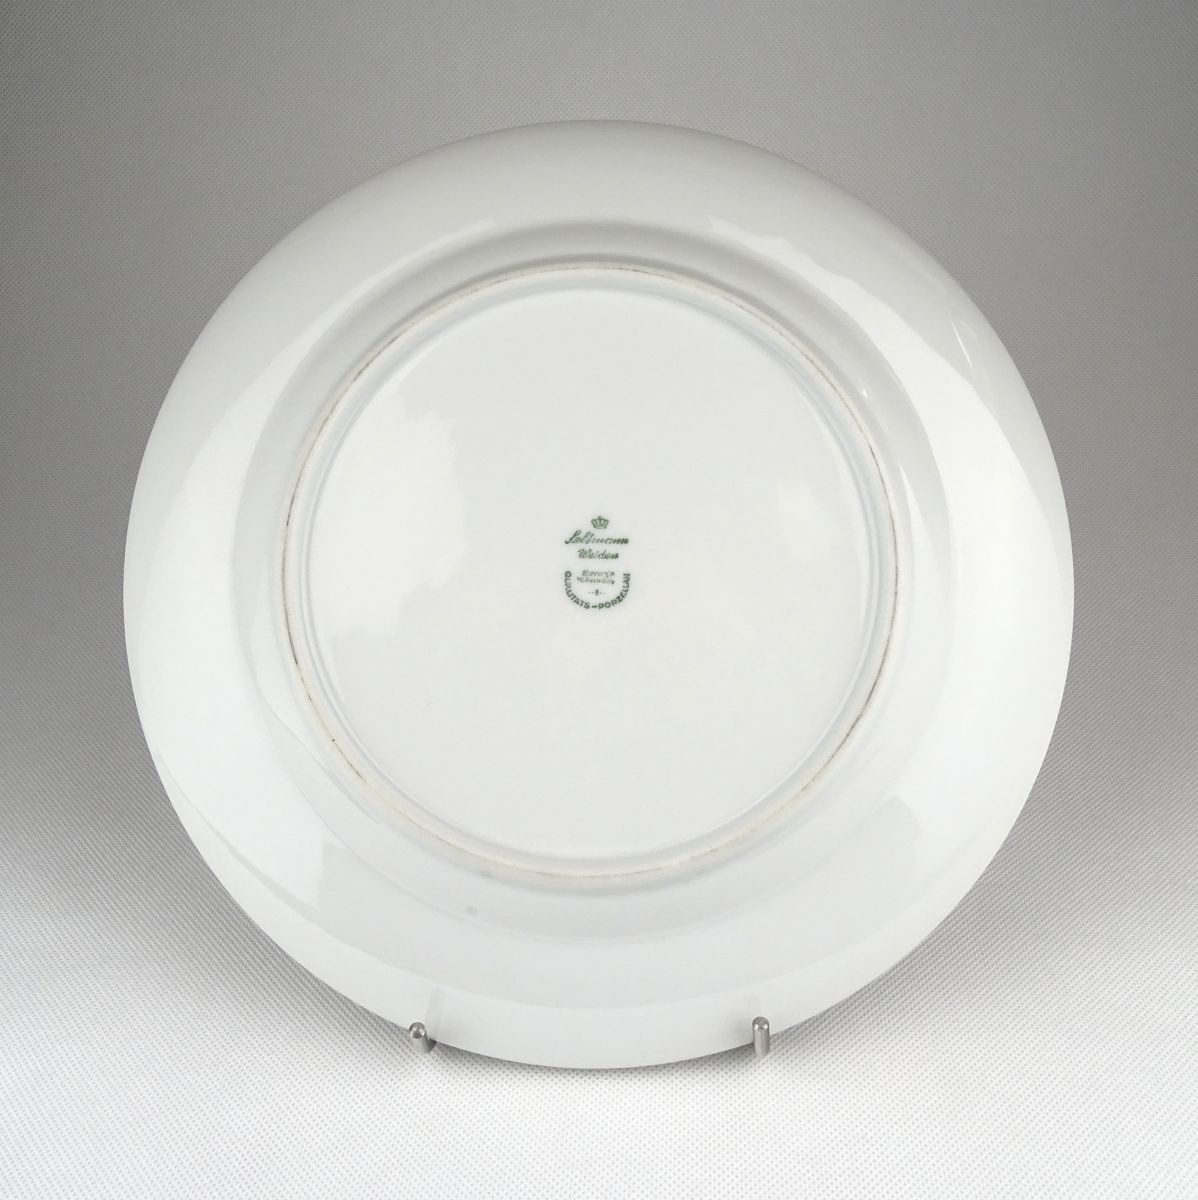 DSC01617.JPG (1198×1200)